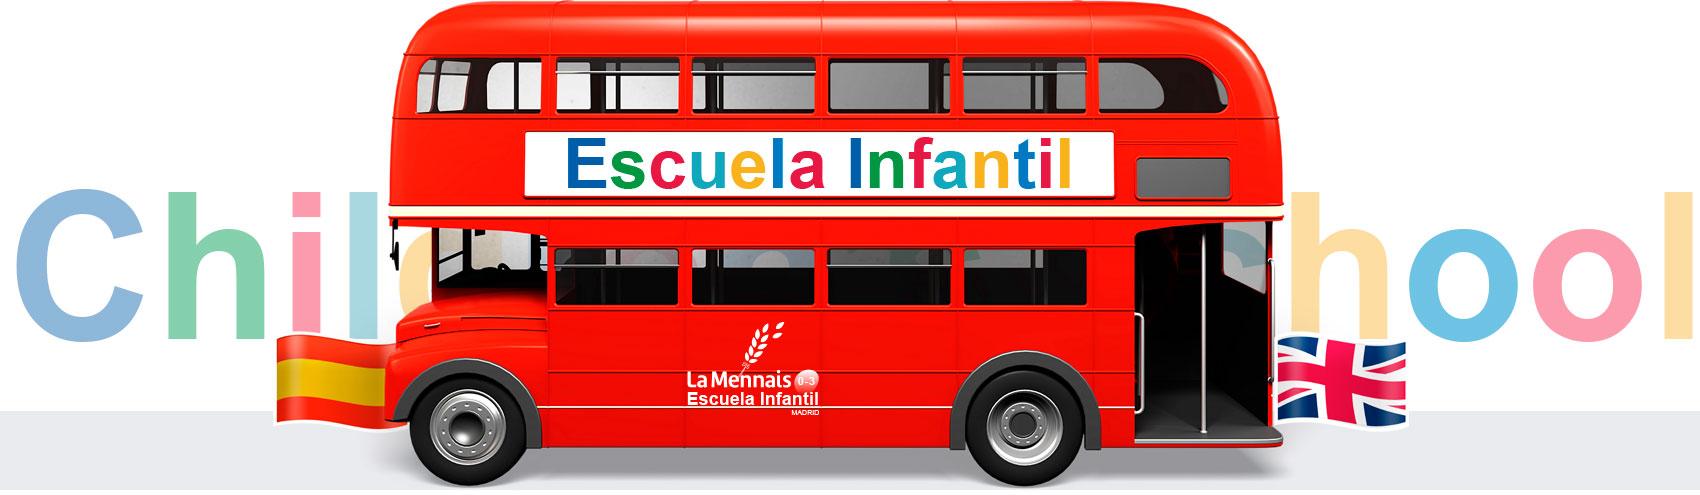 Inglés Escuela Infantil